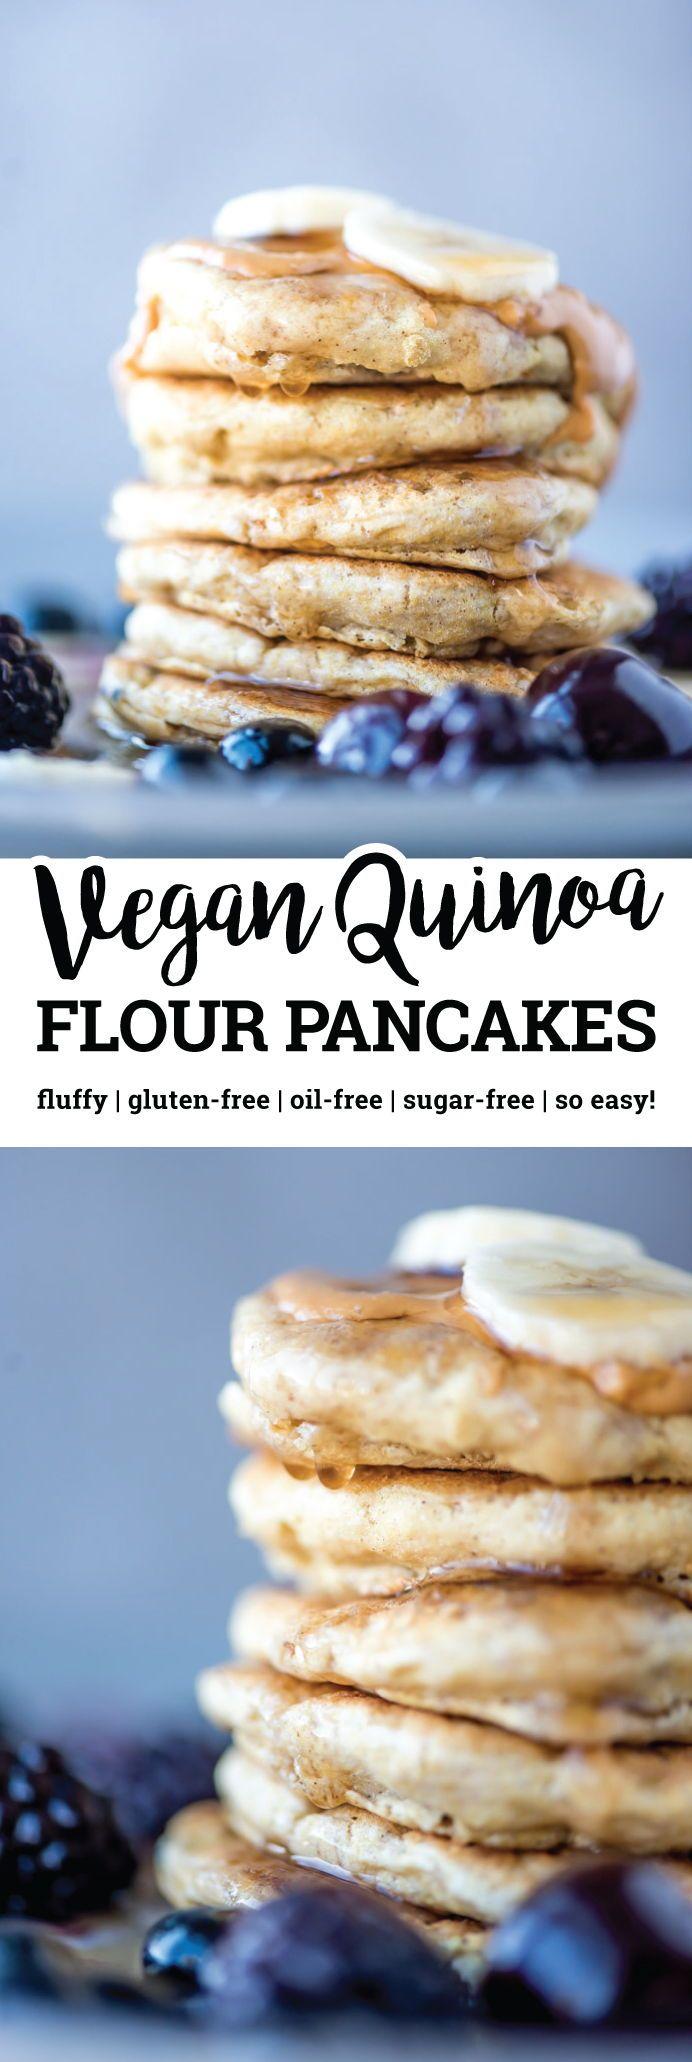 Vegan Quinoa Flour Pancakes Gluten Free Oil Free Recipe Quinoa Flour Pancakes Vegan Quinoa Food